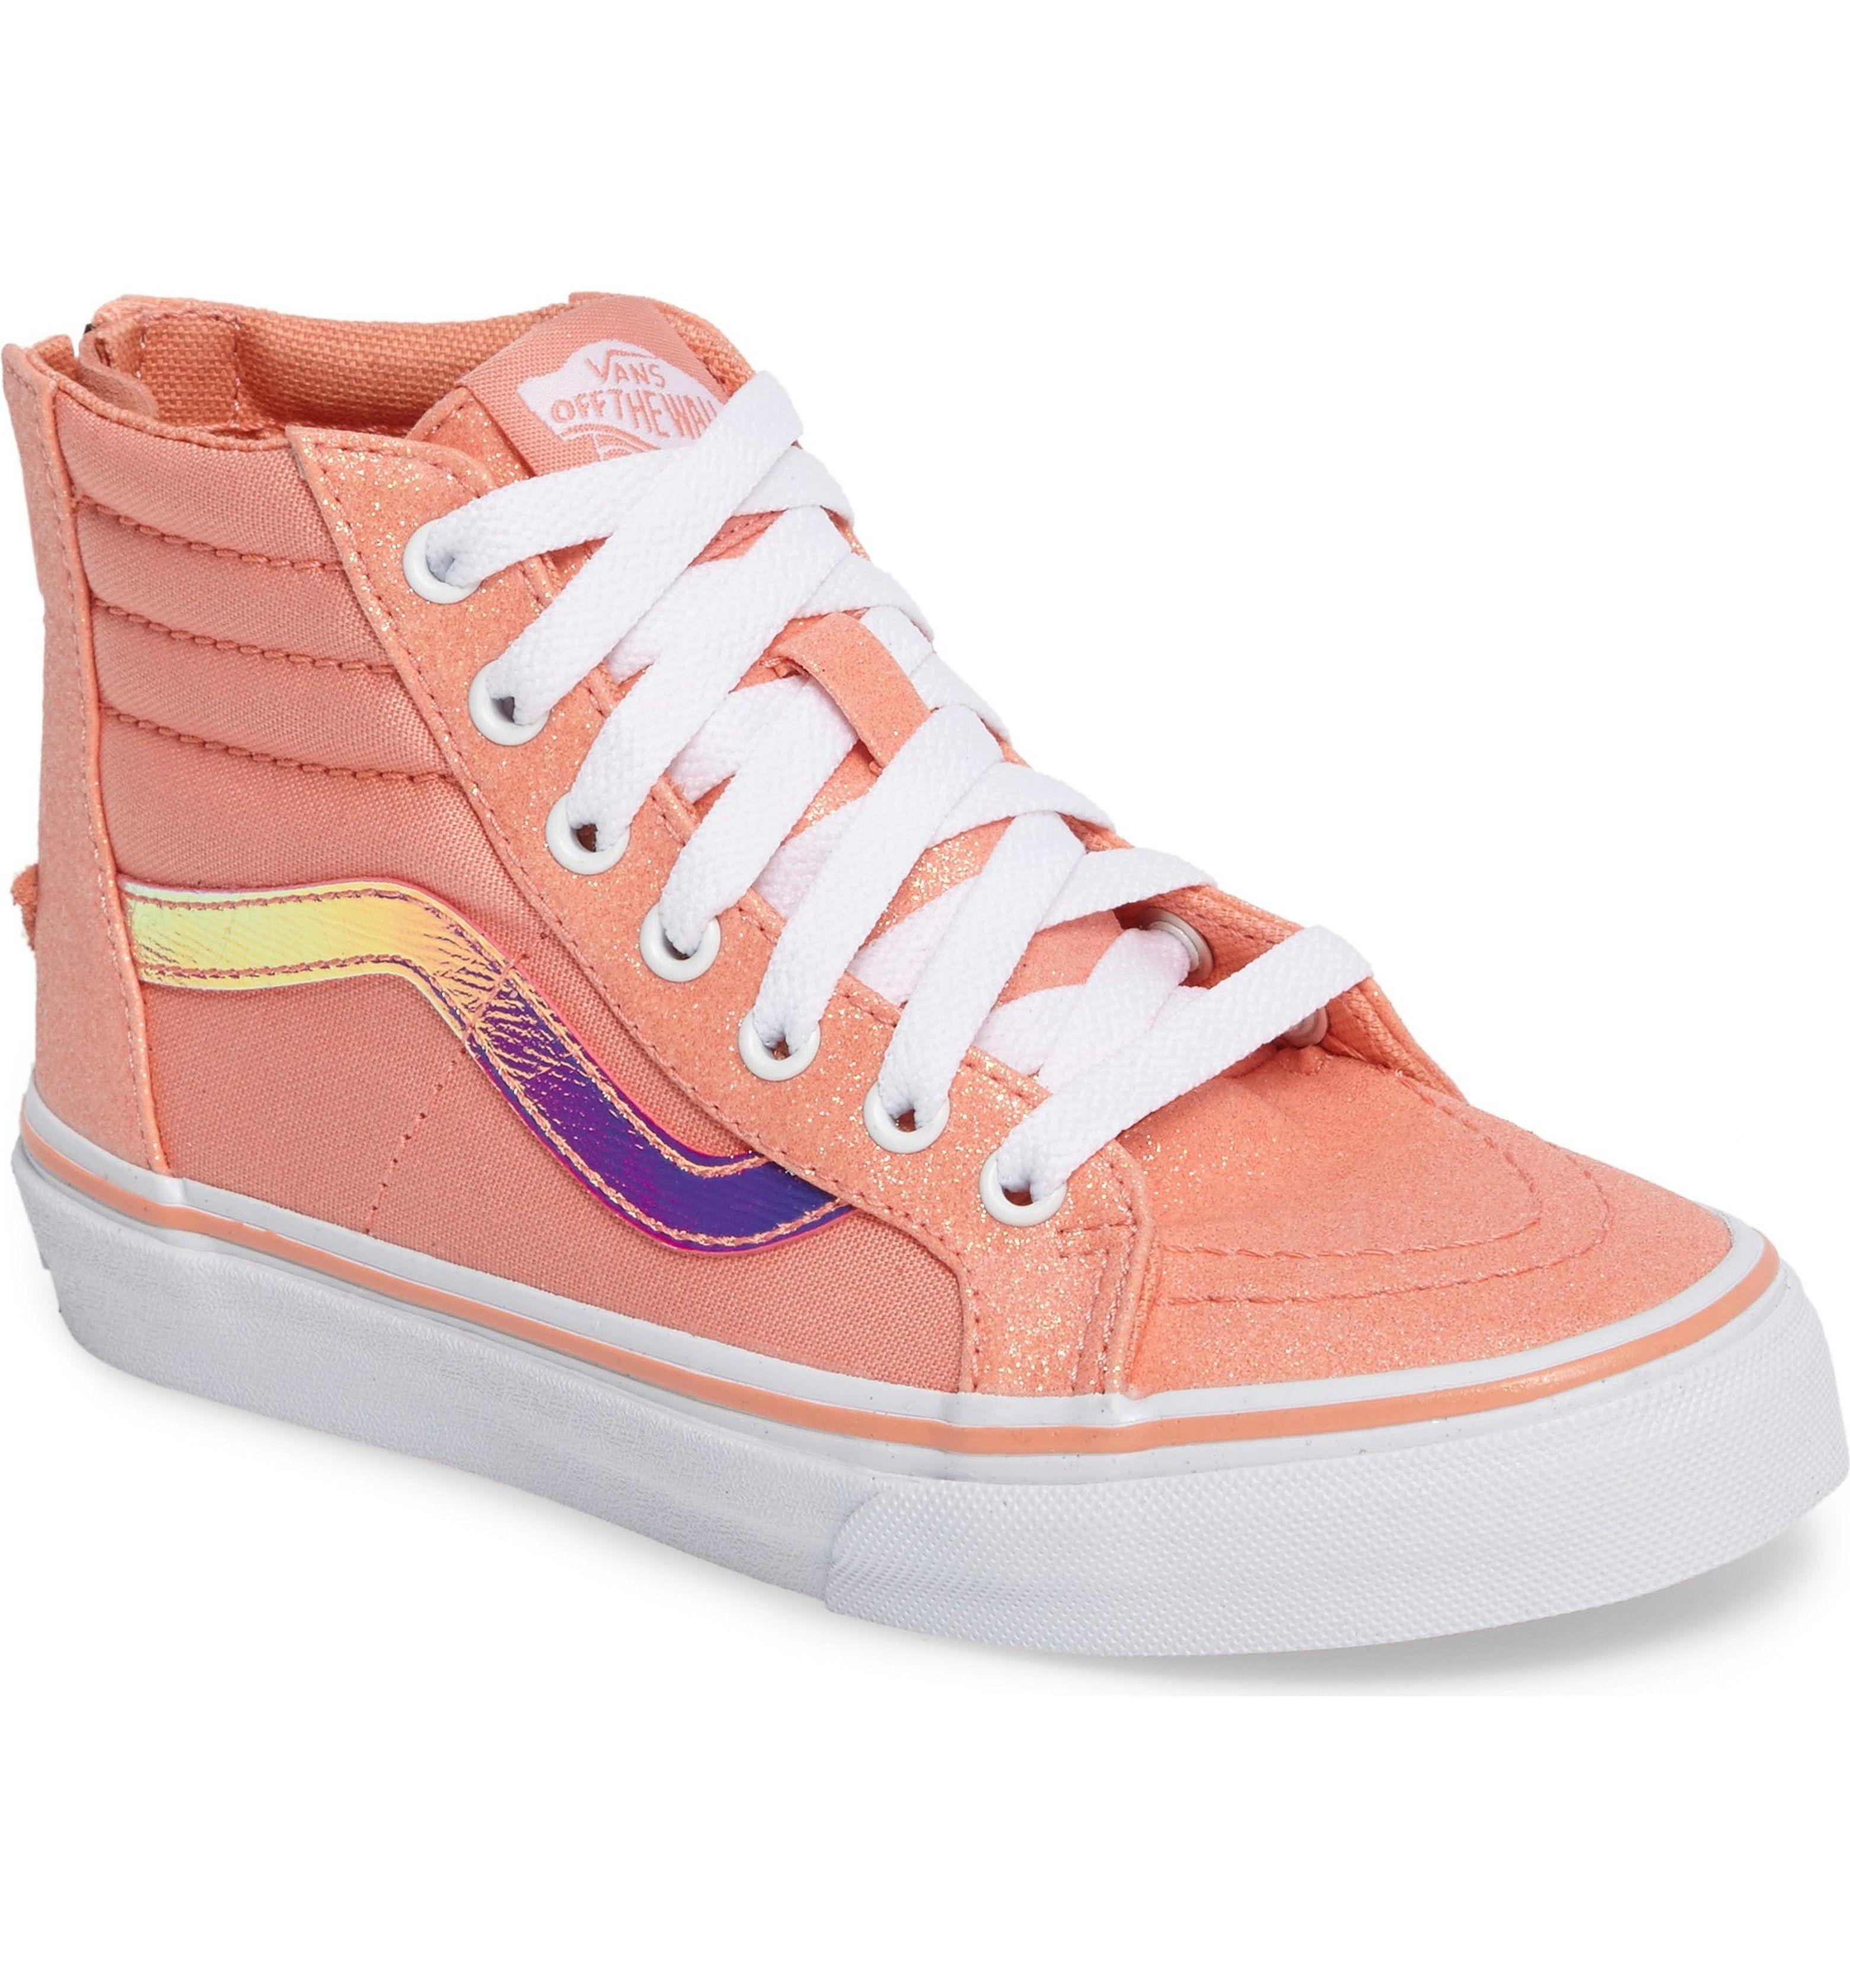 6a16976baf8a83 Main Image - Vans Sk8-Hi Zip Sneaker (Baby